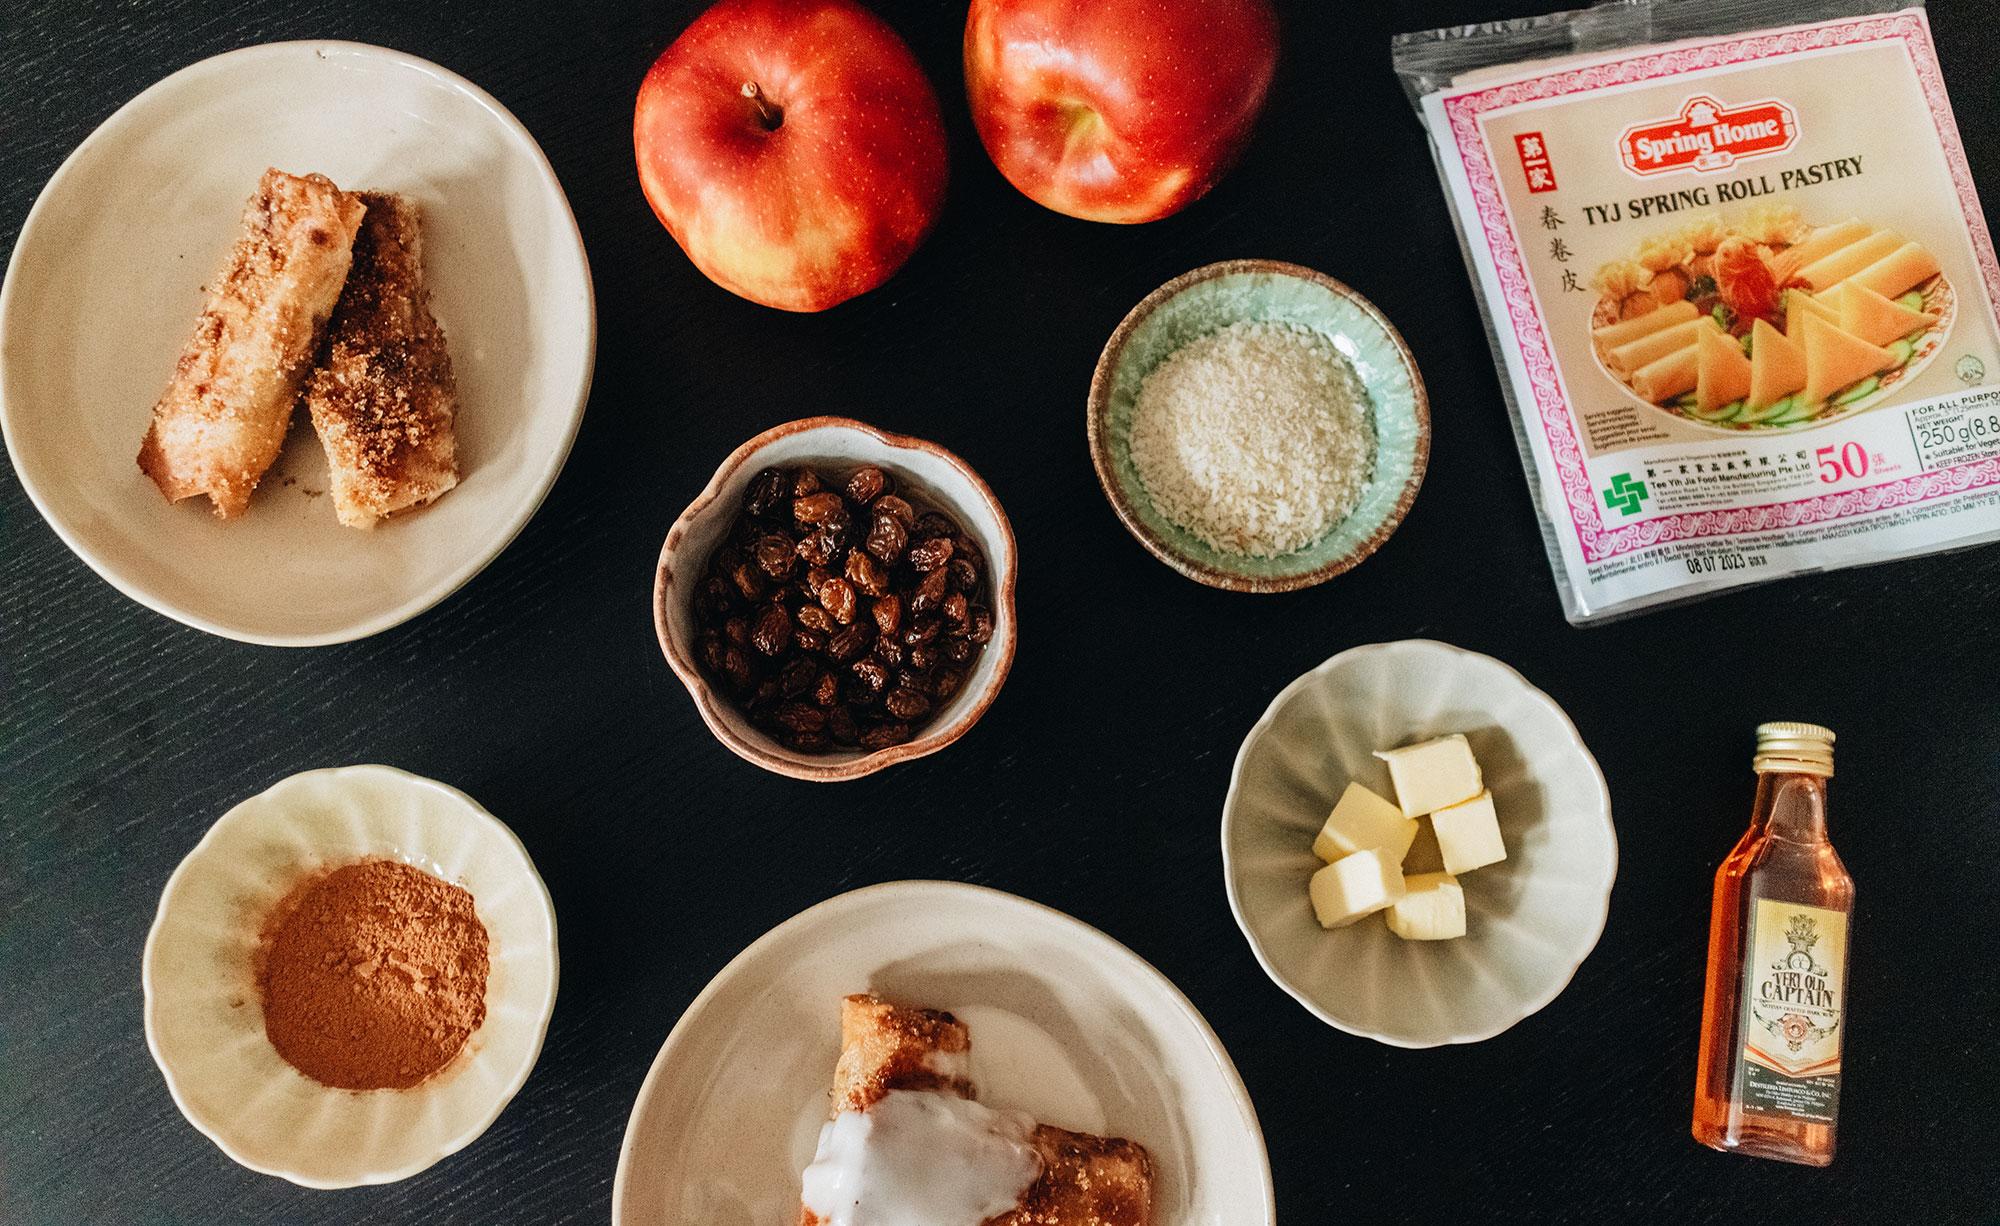 Apple Turon – Filipino Apple Lumpia Rezept / Filippinische Apfeltaschen – iHeartAlice.com / Travel, Lifestyle, Food & Fashionblog by Alice M. Huynh